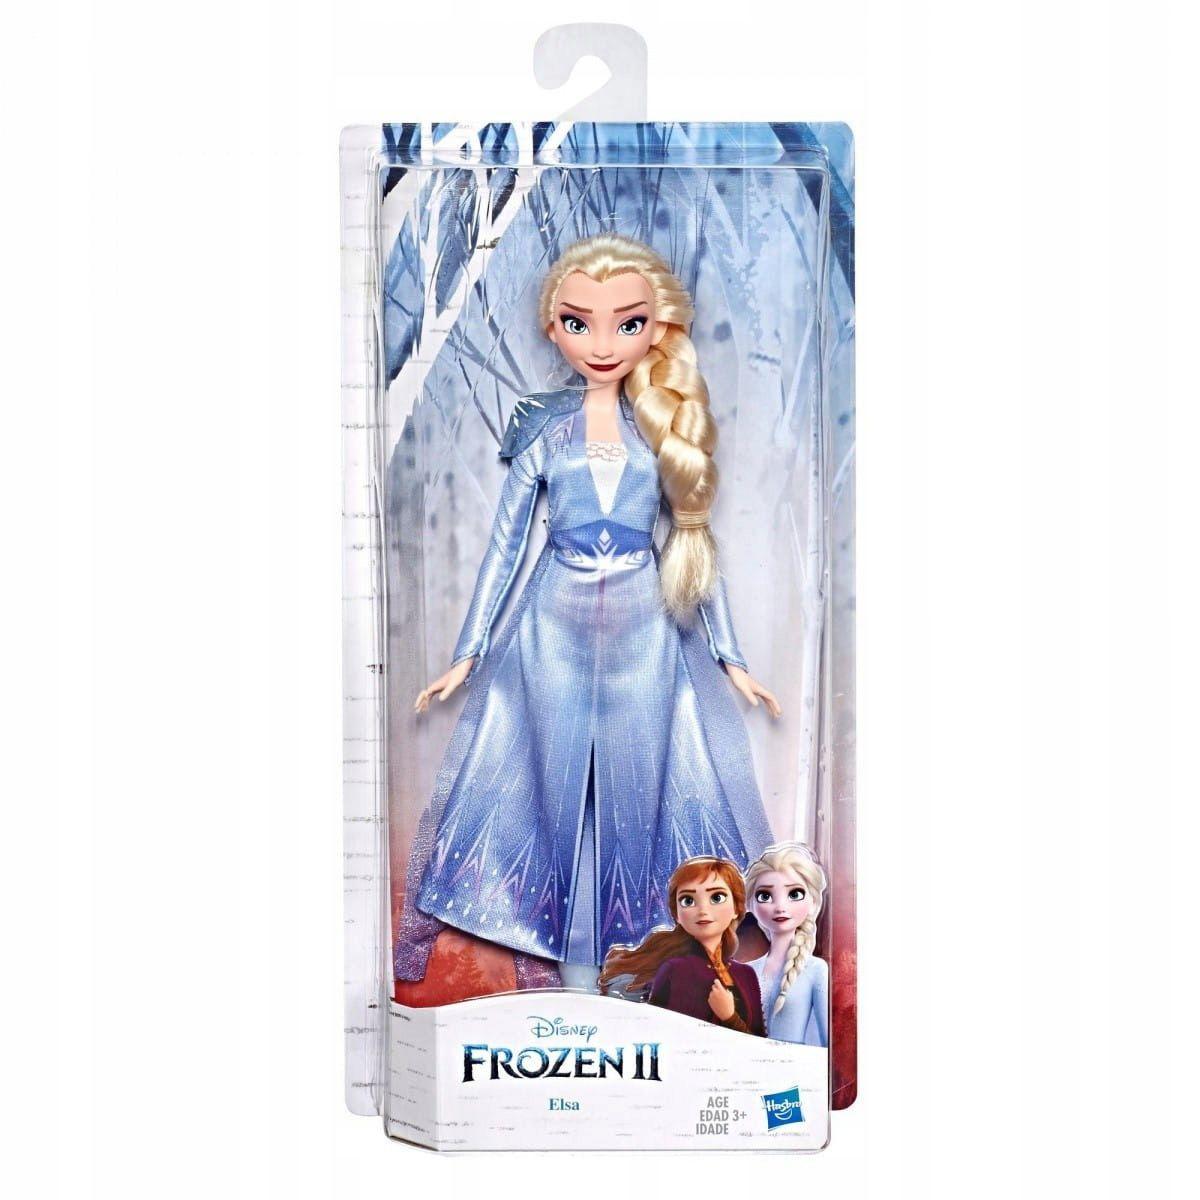 Boneca Elsa Frozen 2 Original Lançamento - Hasbro E6709 FULL